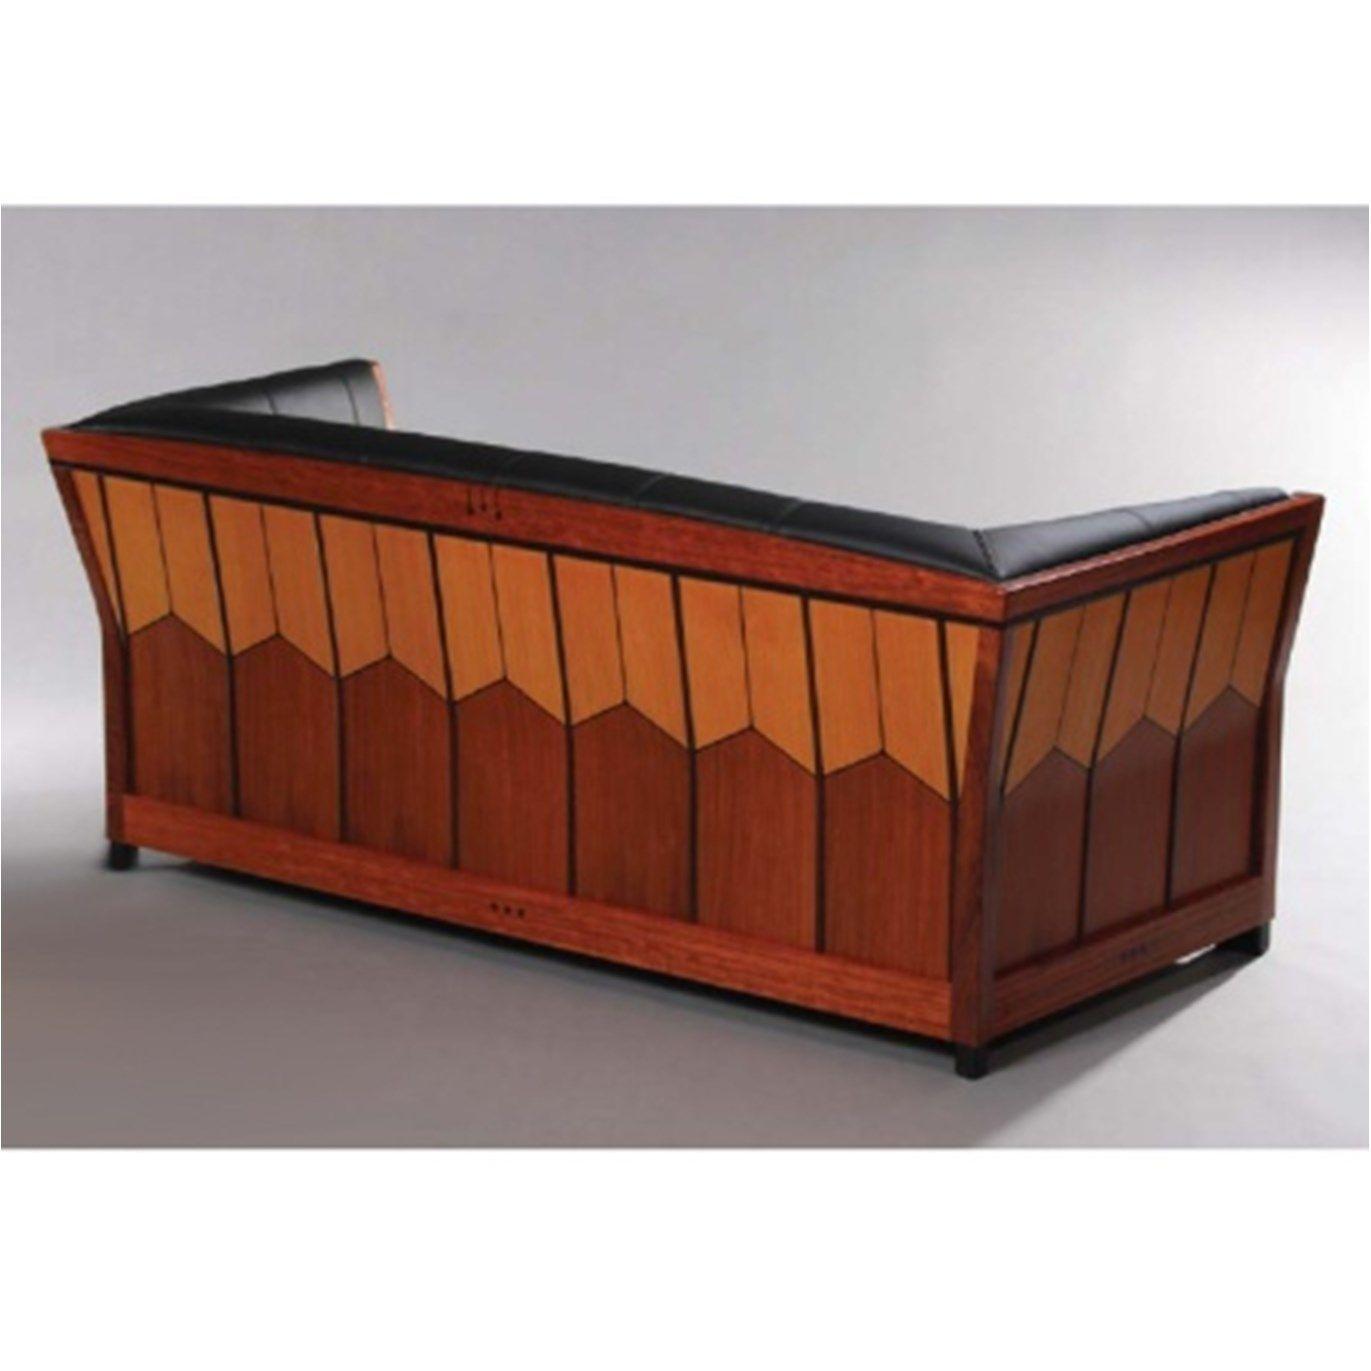 Schuitema Decoforma Salontafel.Art Deco Couch 2 5 Seater Lawrence Art Deco Art Deco Fabric Deco